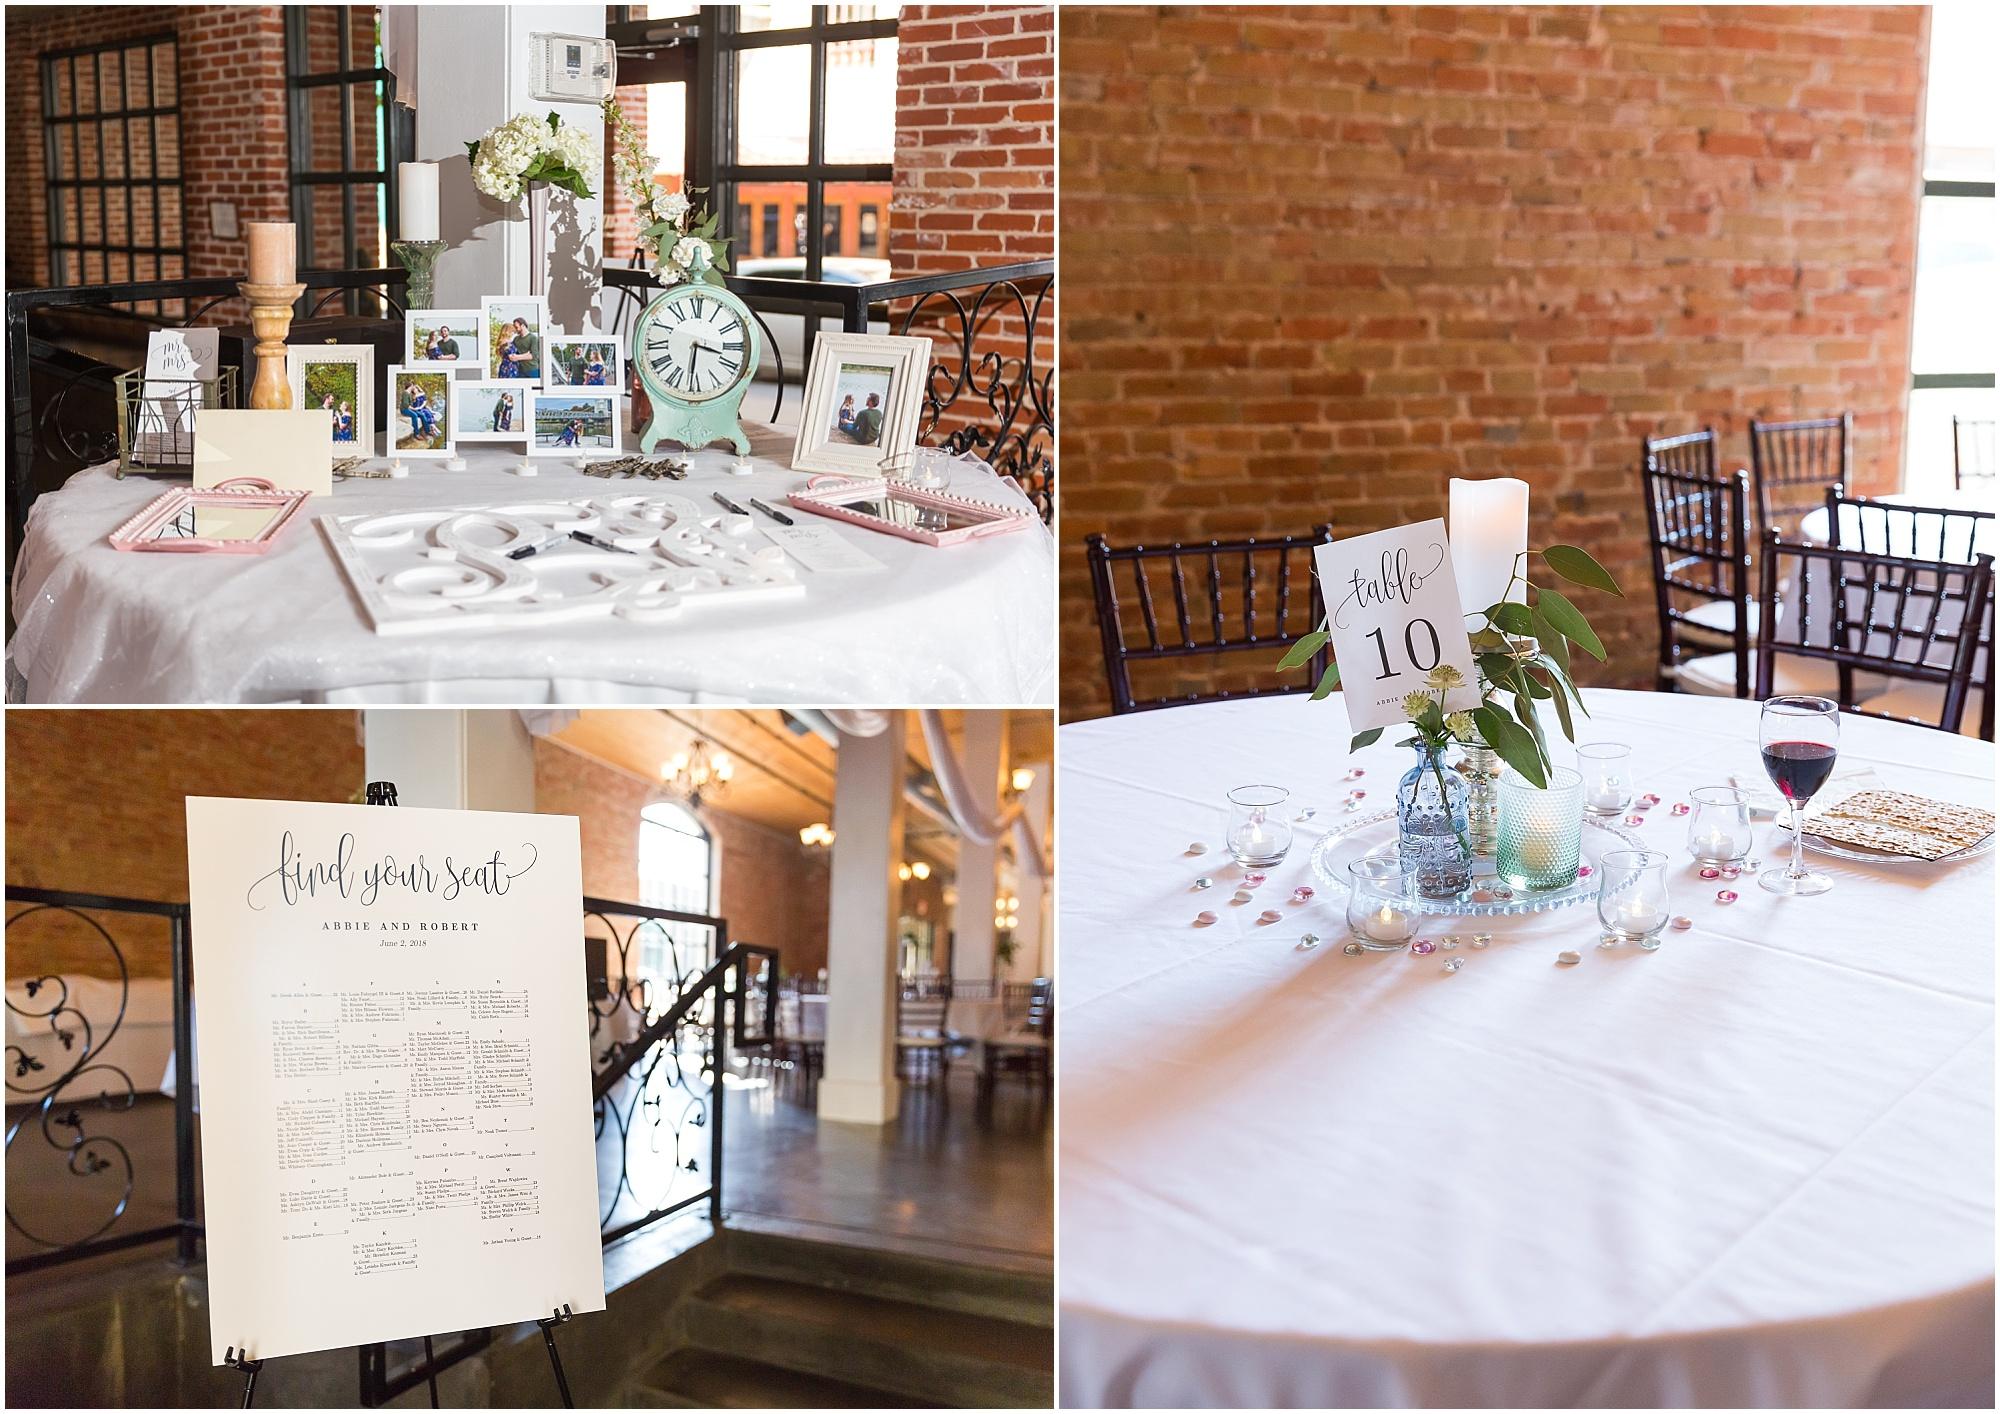 Reception details at Downtown warehouse wedding in Waco, Texas - www.jasonandmelaina.com